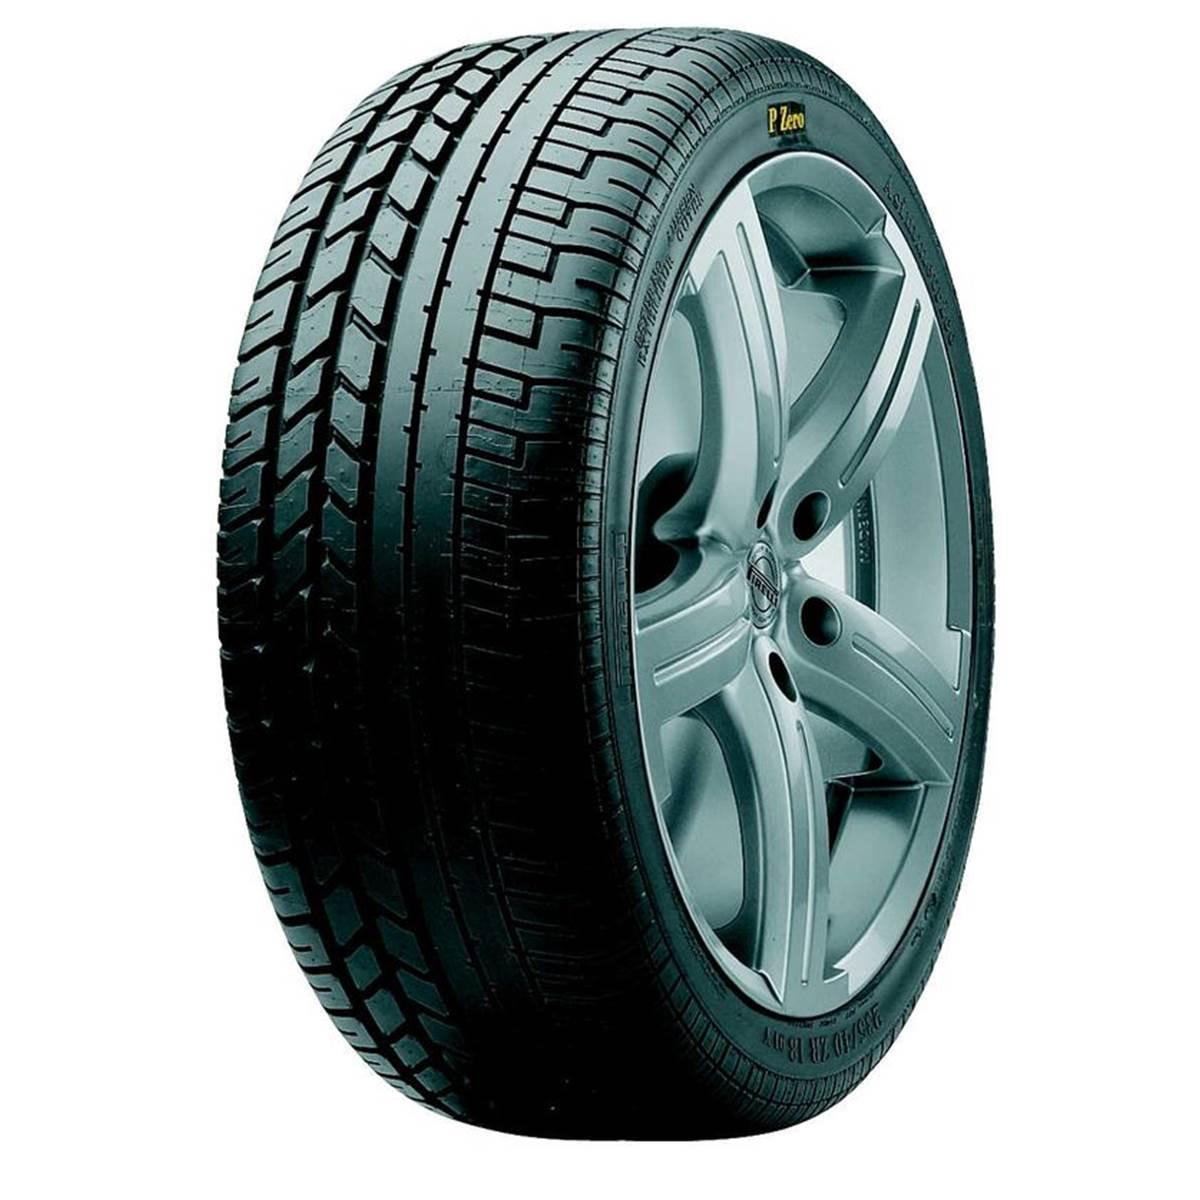 Pneu Pirelli 285/45R18 103Y Pzero Rosso Asimmetrico